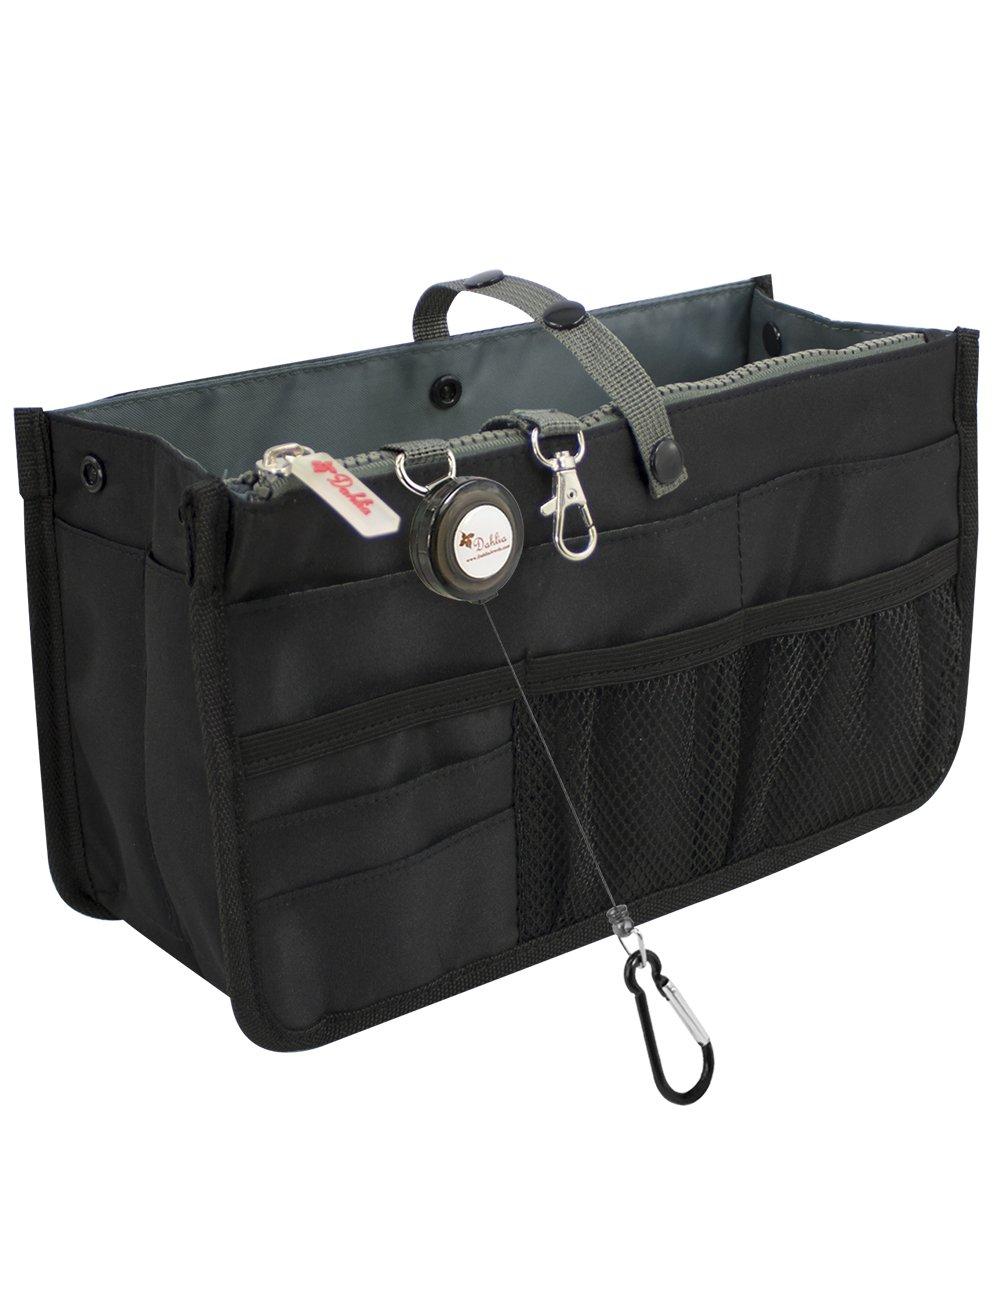 Dahlia's Patented Handbag Purse Organizer Insert - STURDY Flexible, Black by Dahlia